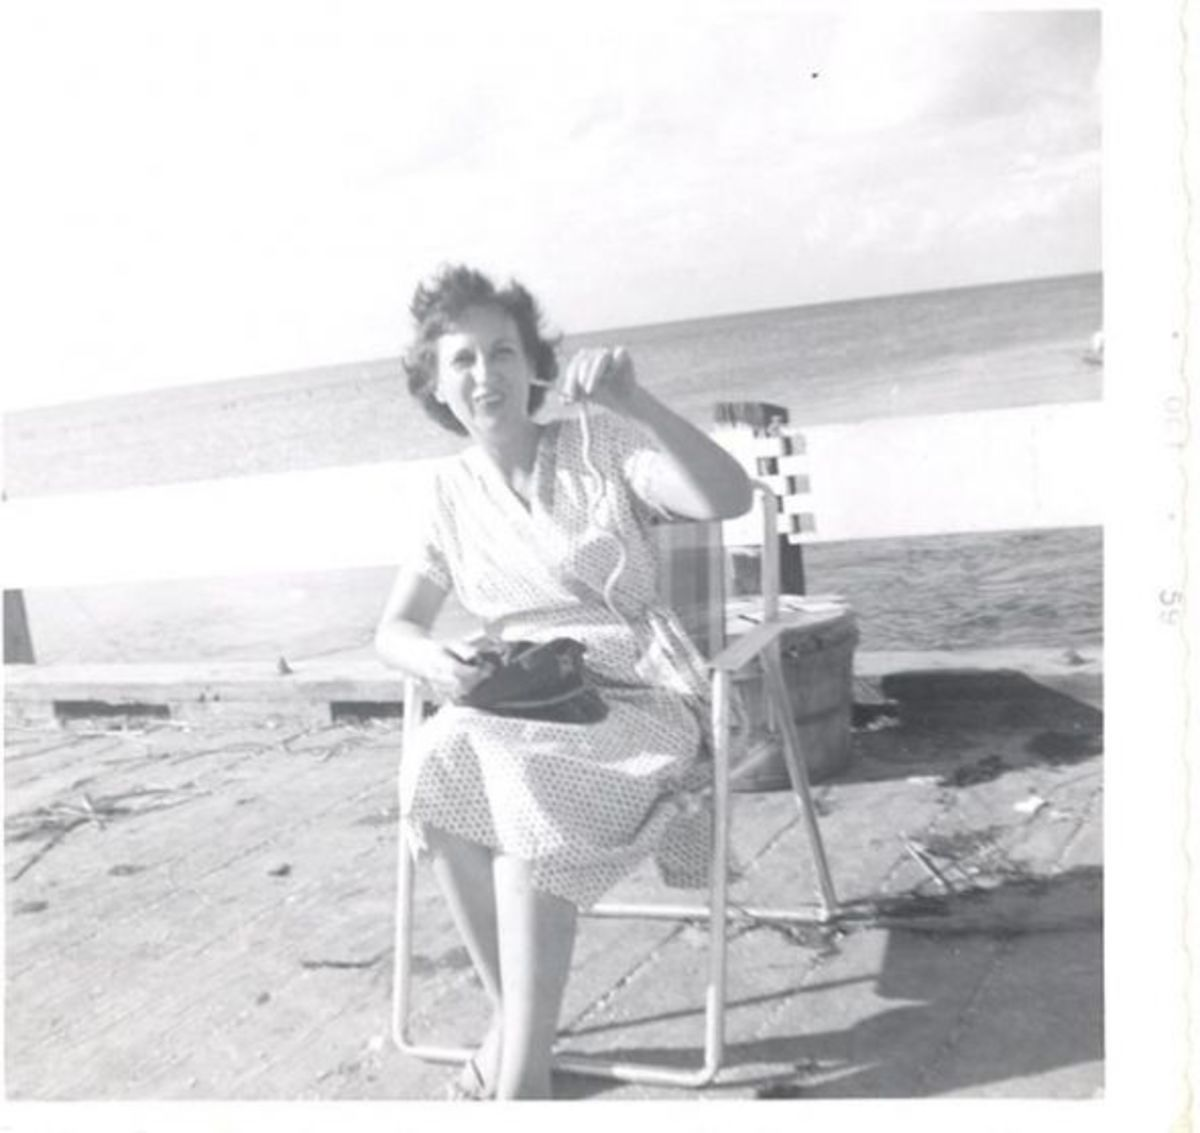 neworleans_1950s